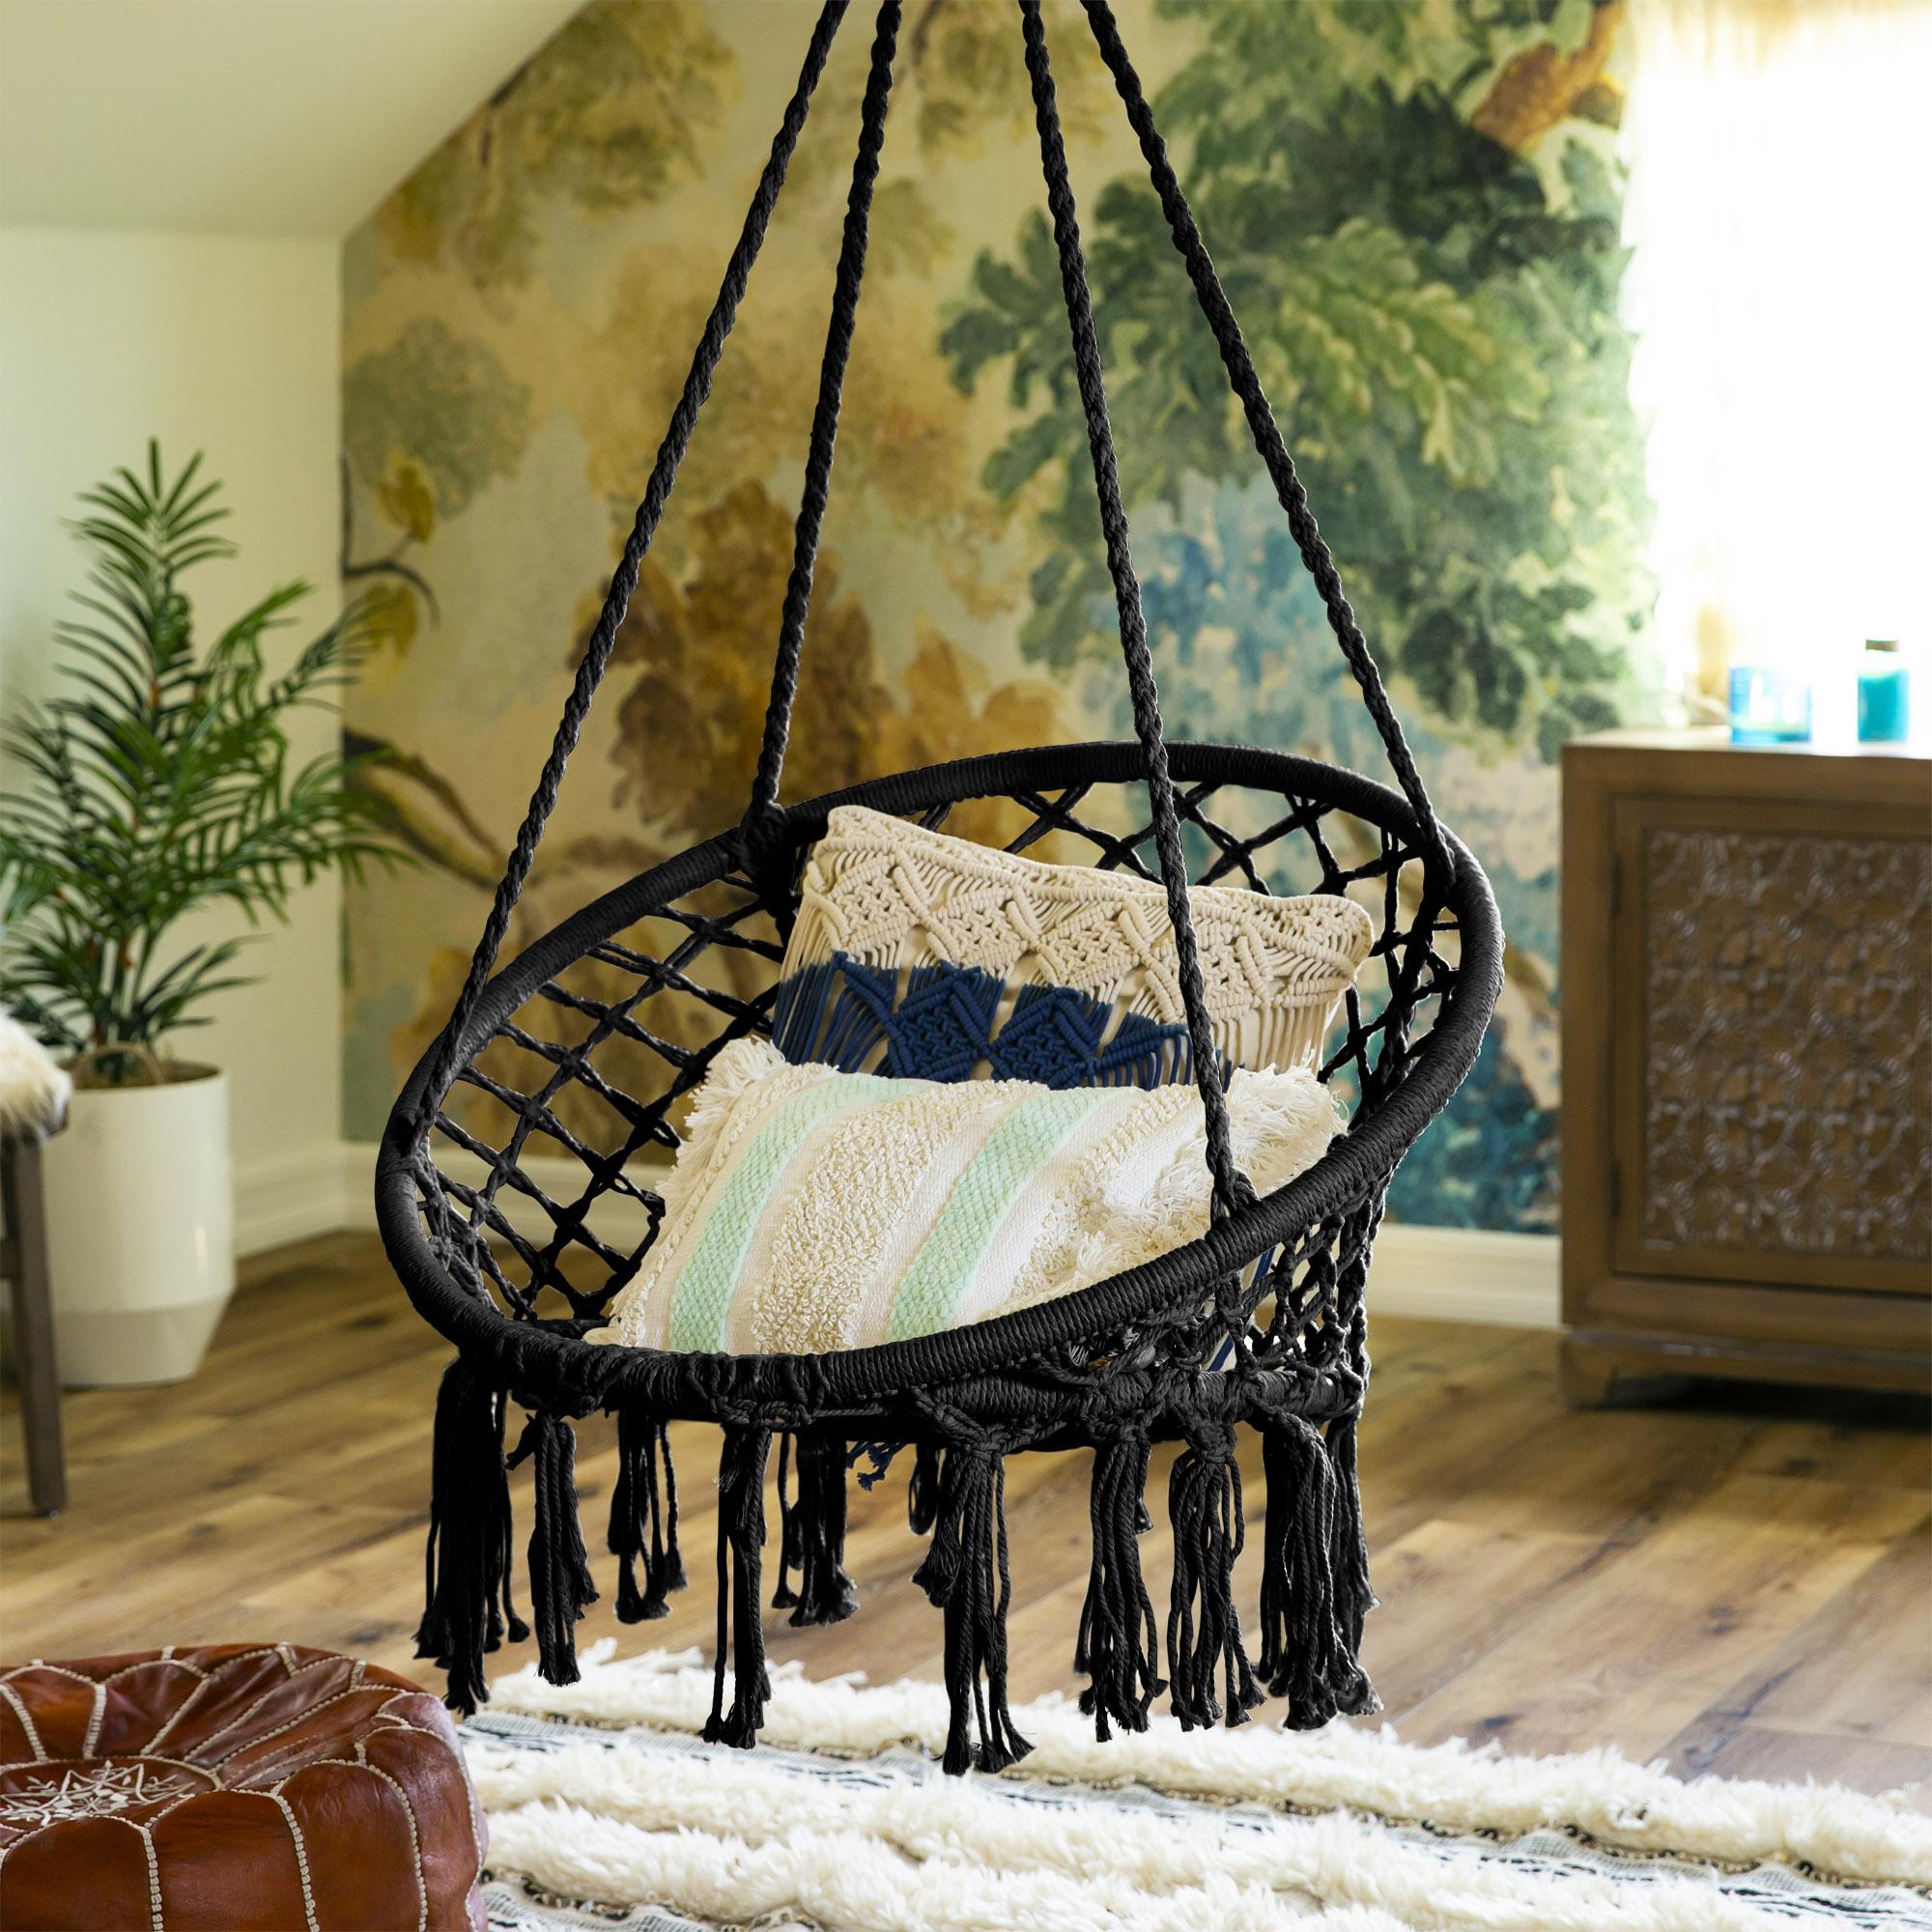 BCP-Handwoven-Cotton-Macrame-Hammock-Hanging-Chair-Swing-w-Backrest thumbnail 16